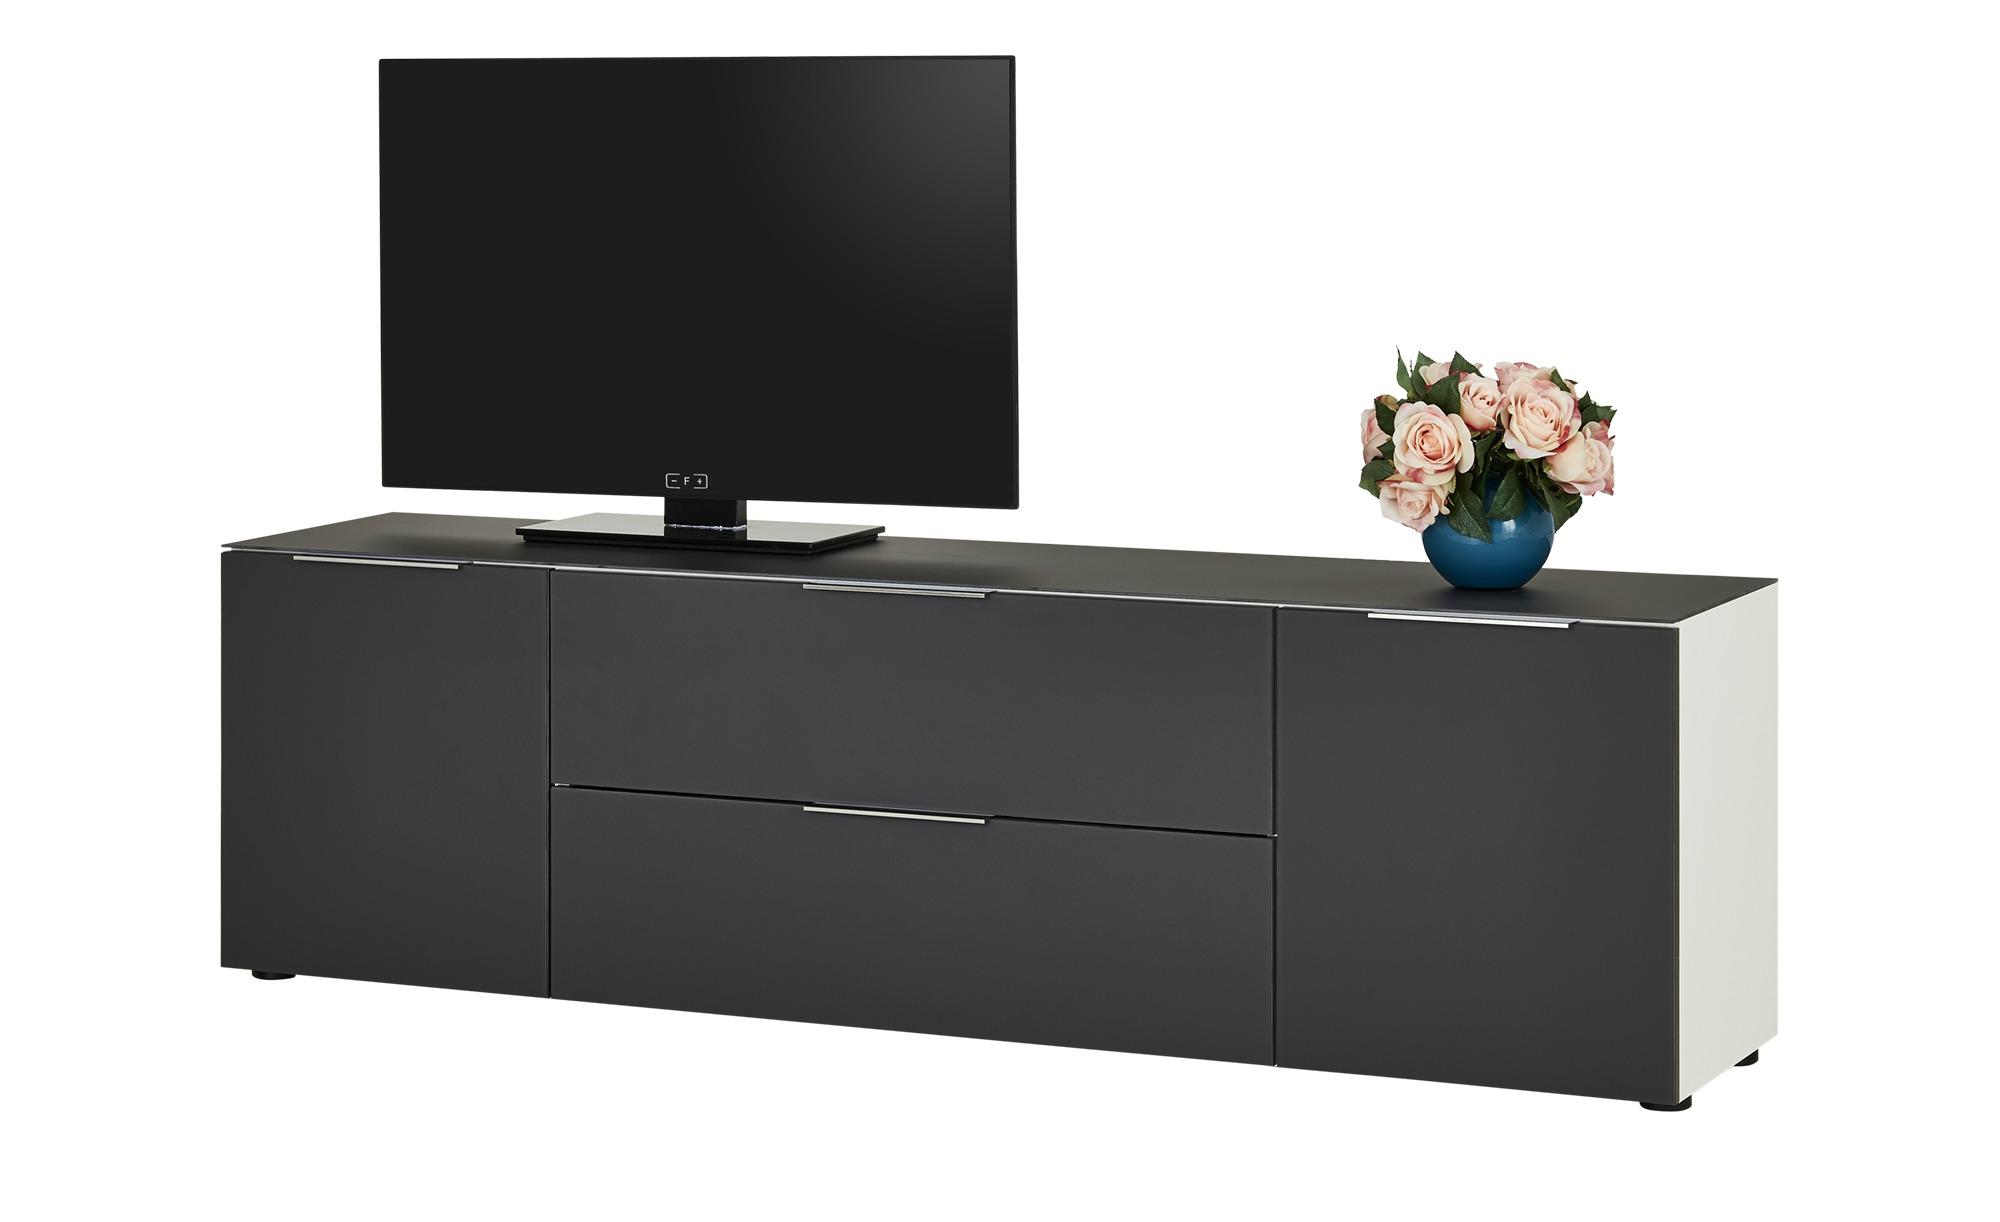 TV-Lowboard  Vitreo ¦ grau ¦ Maße (cm): B: 180,4 H: 53,9 T: 40 TV- & Media Möbel > TV-Racks - Höffner